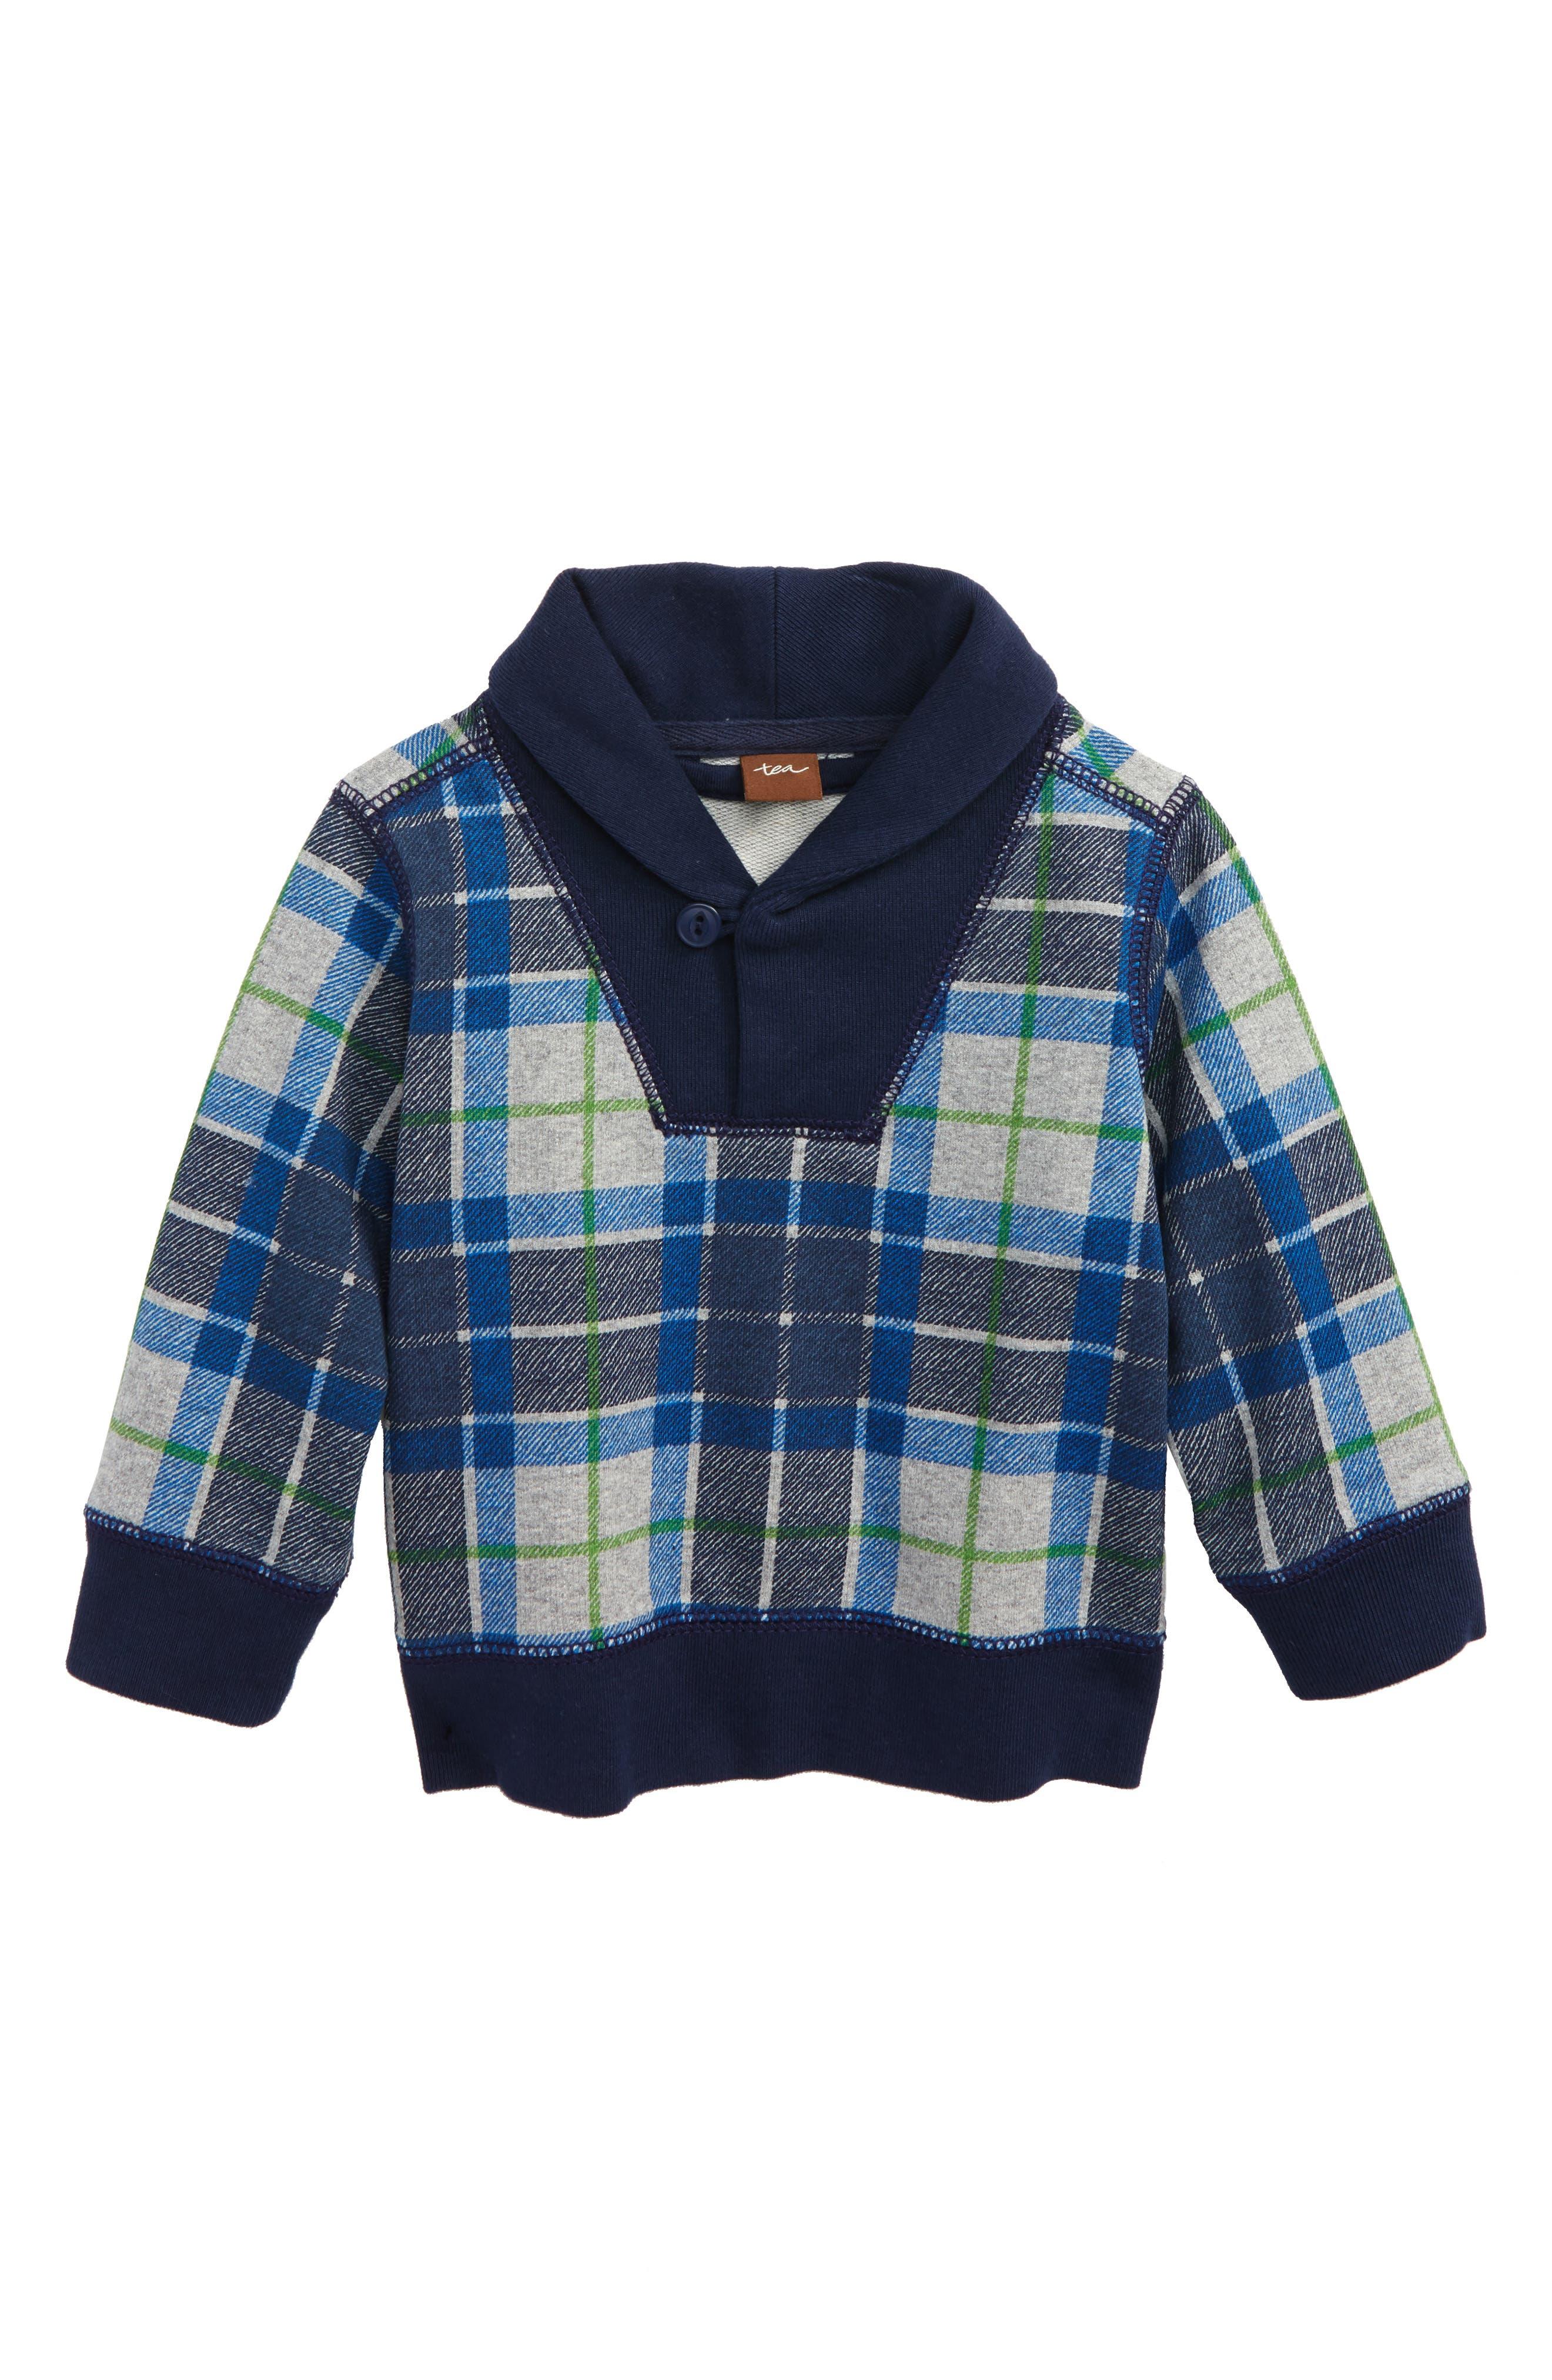 Tartan Pullover Sweater,                             Main thumbnail 1, color,                             020